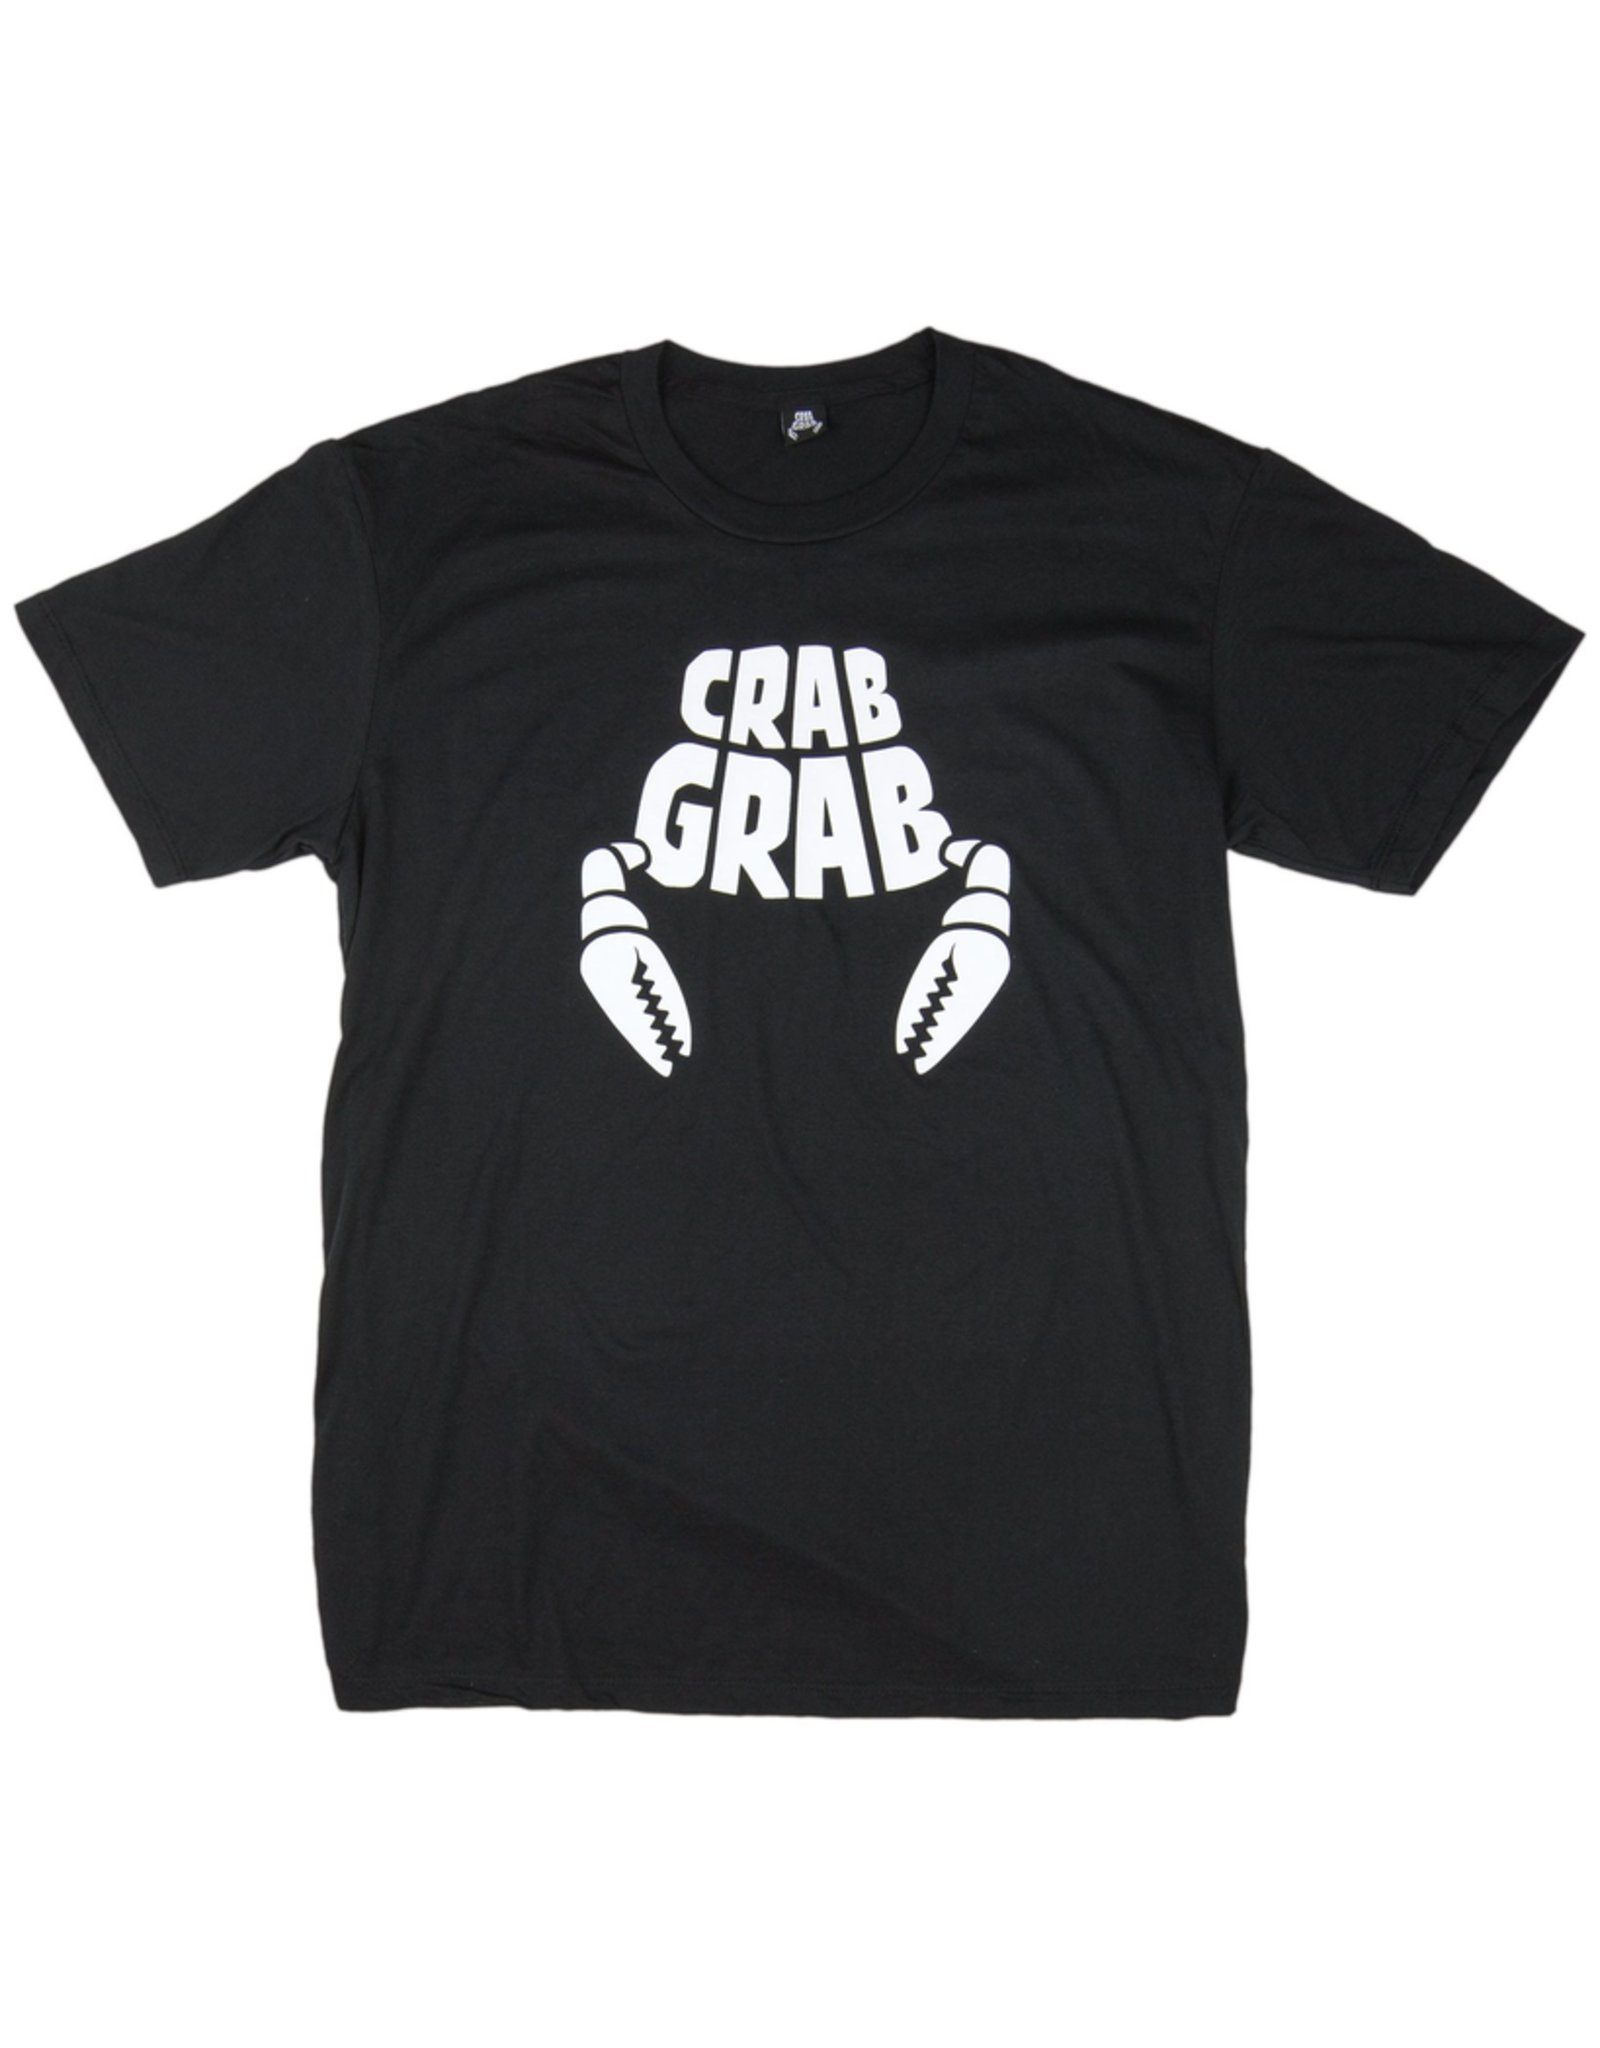 Crab Grab Crab Grab - Classic Tee - XL - Black